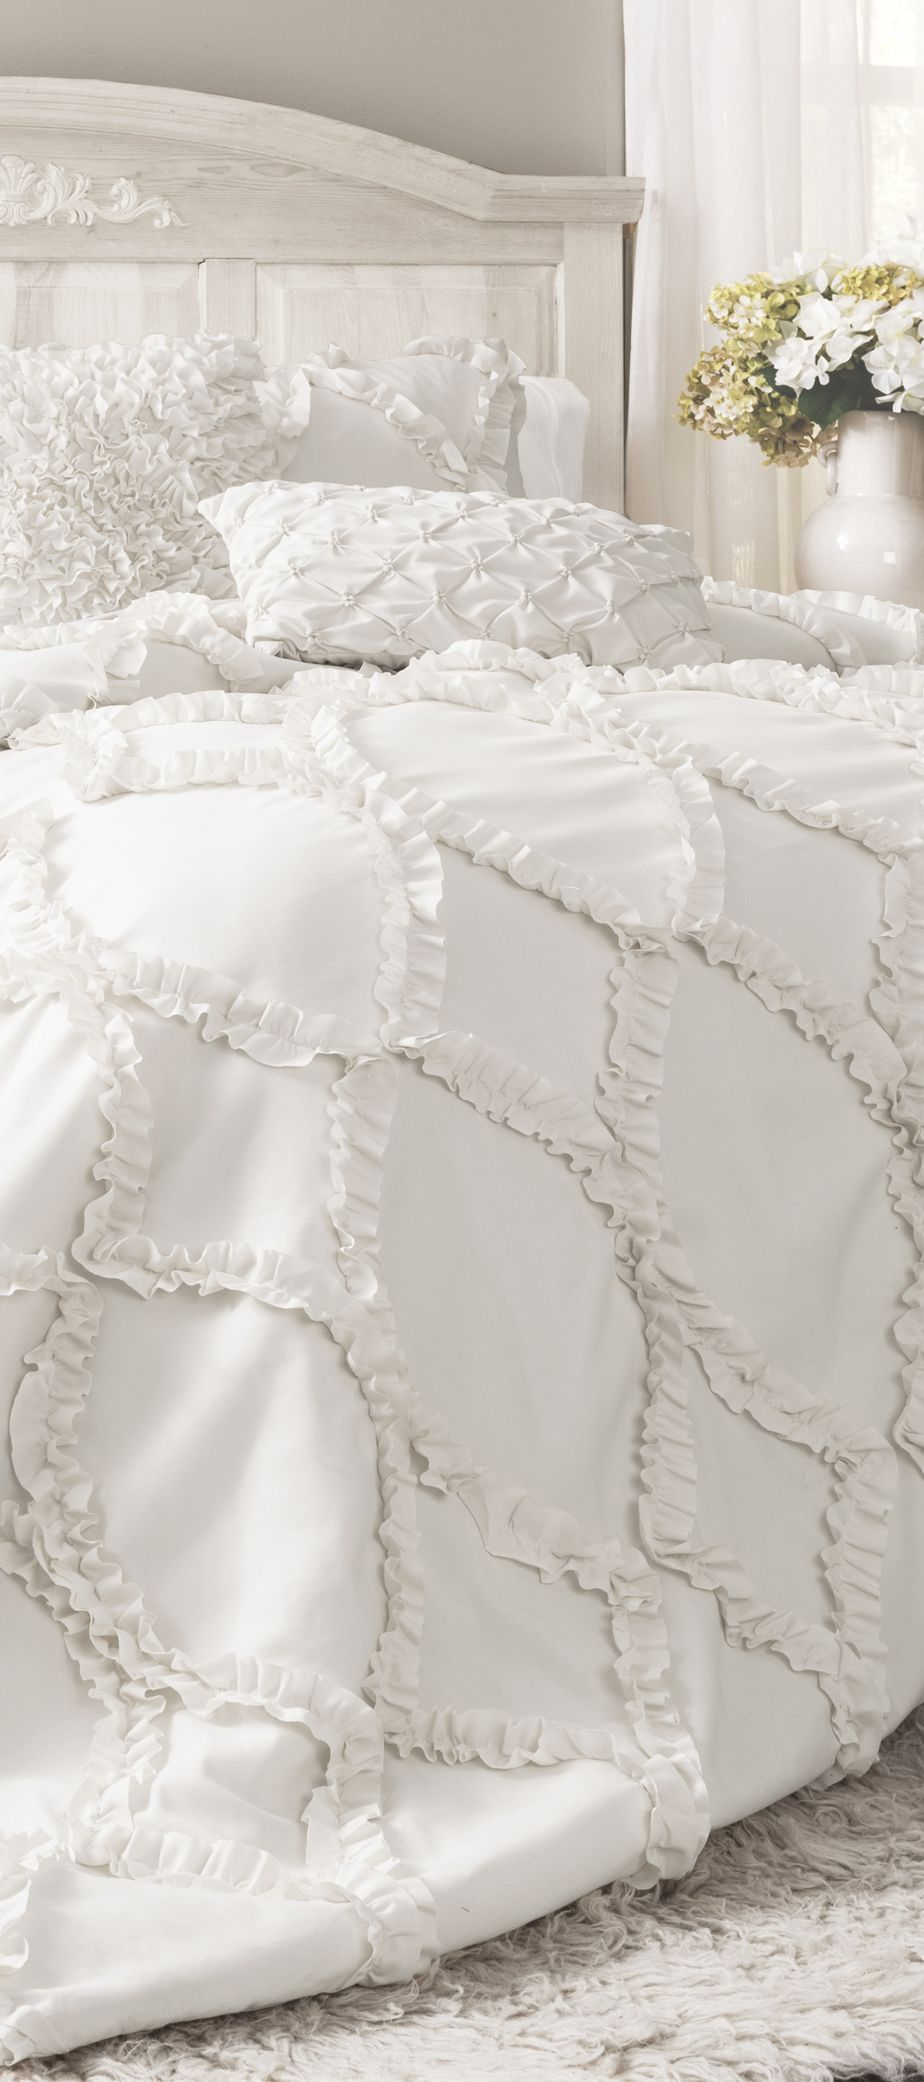 Farmhouse Comforter Bedroom comforter sets, Farmhouse